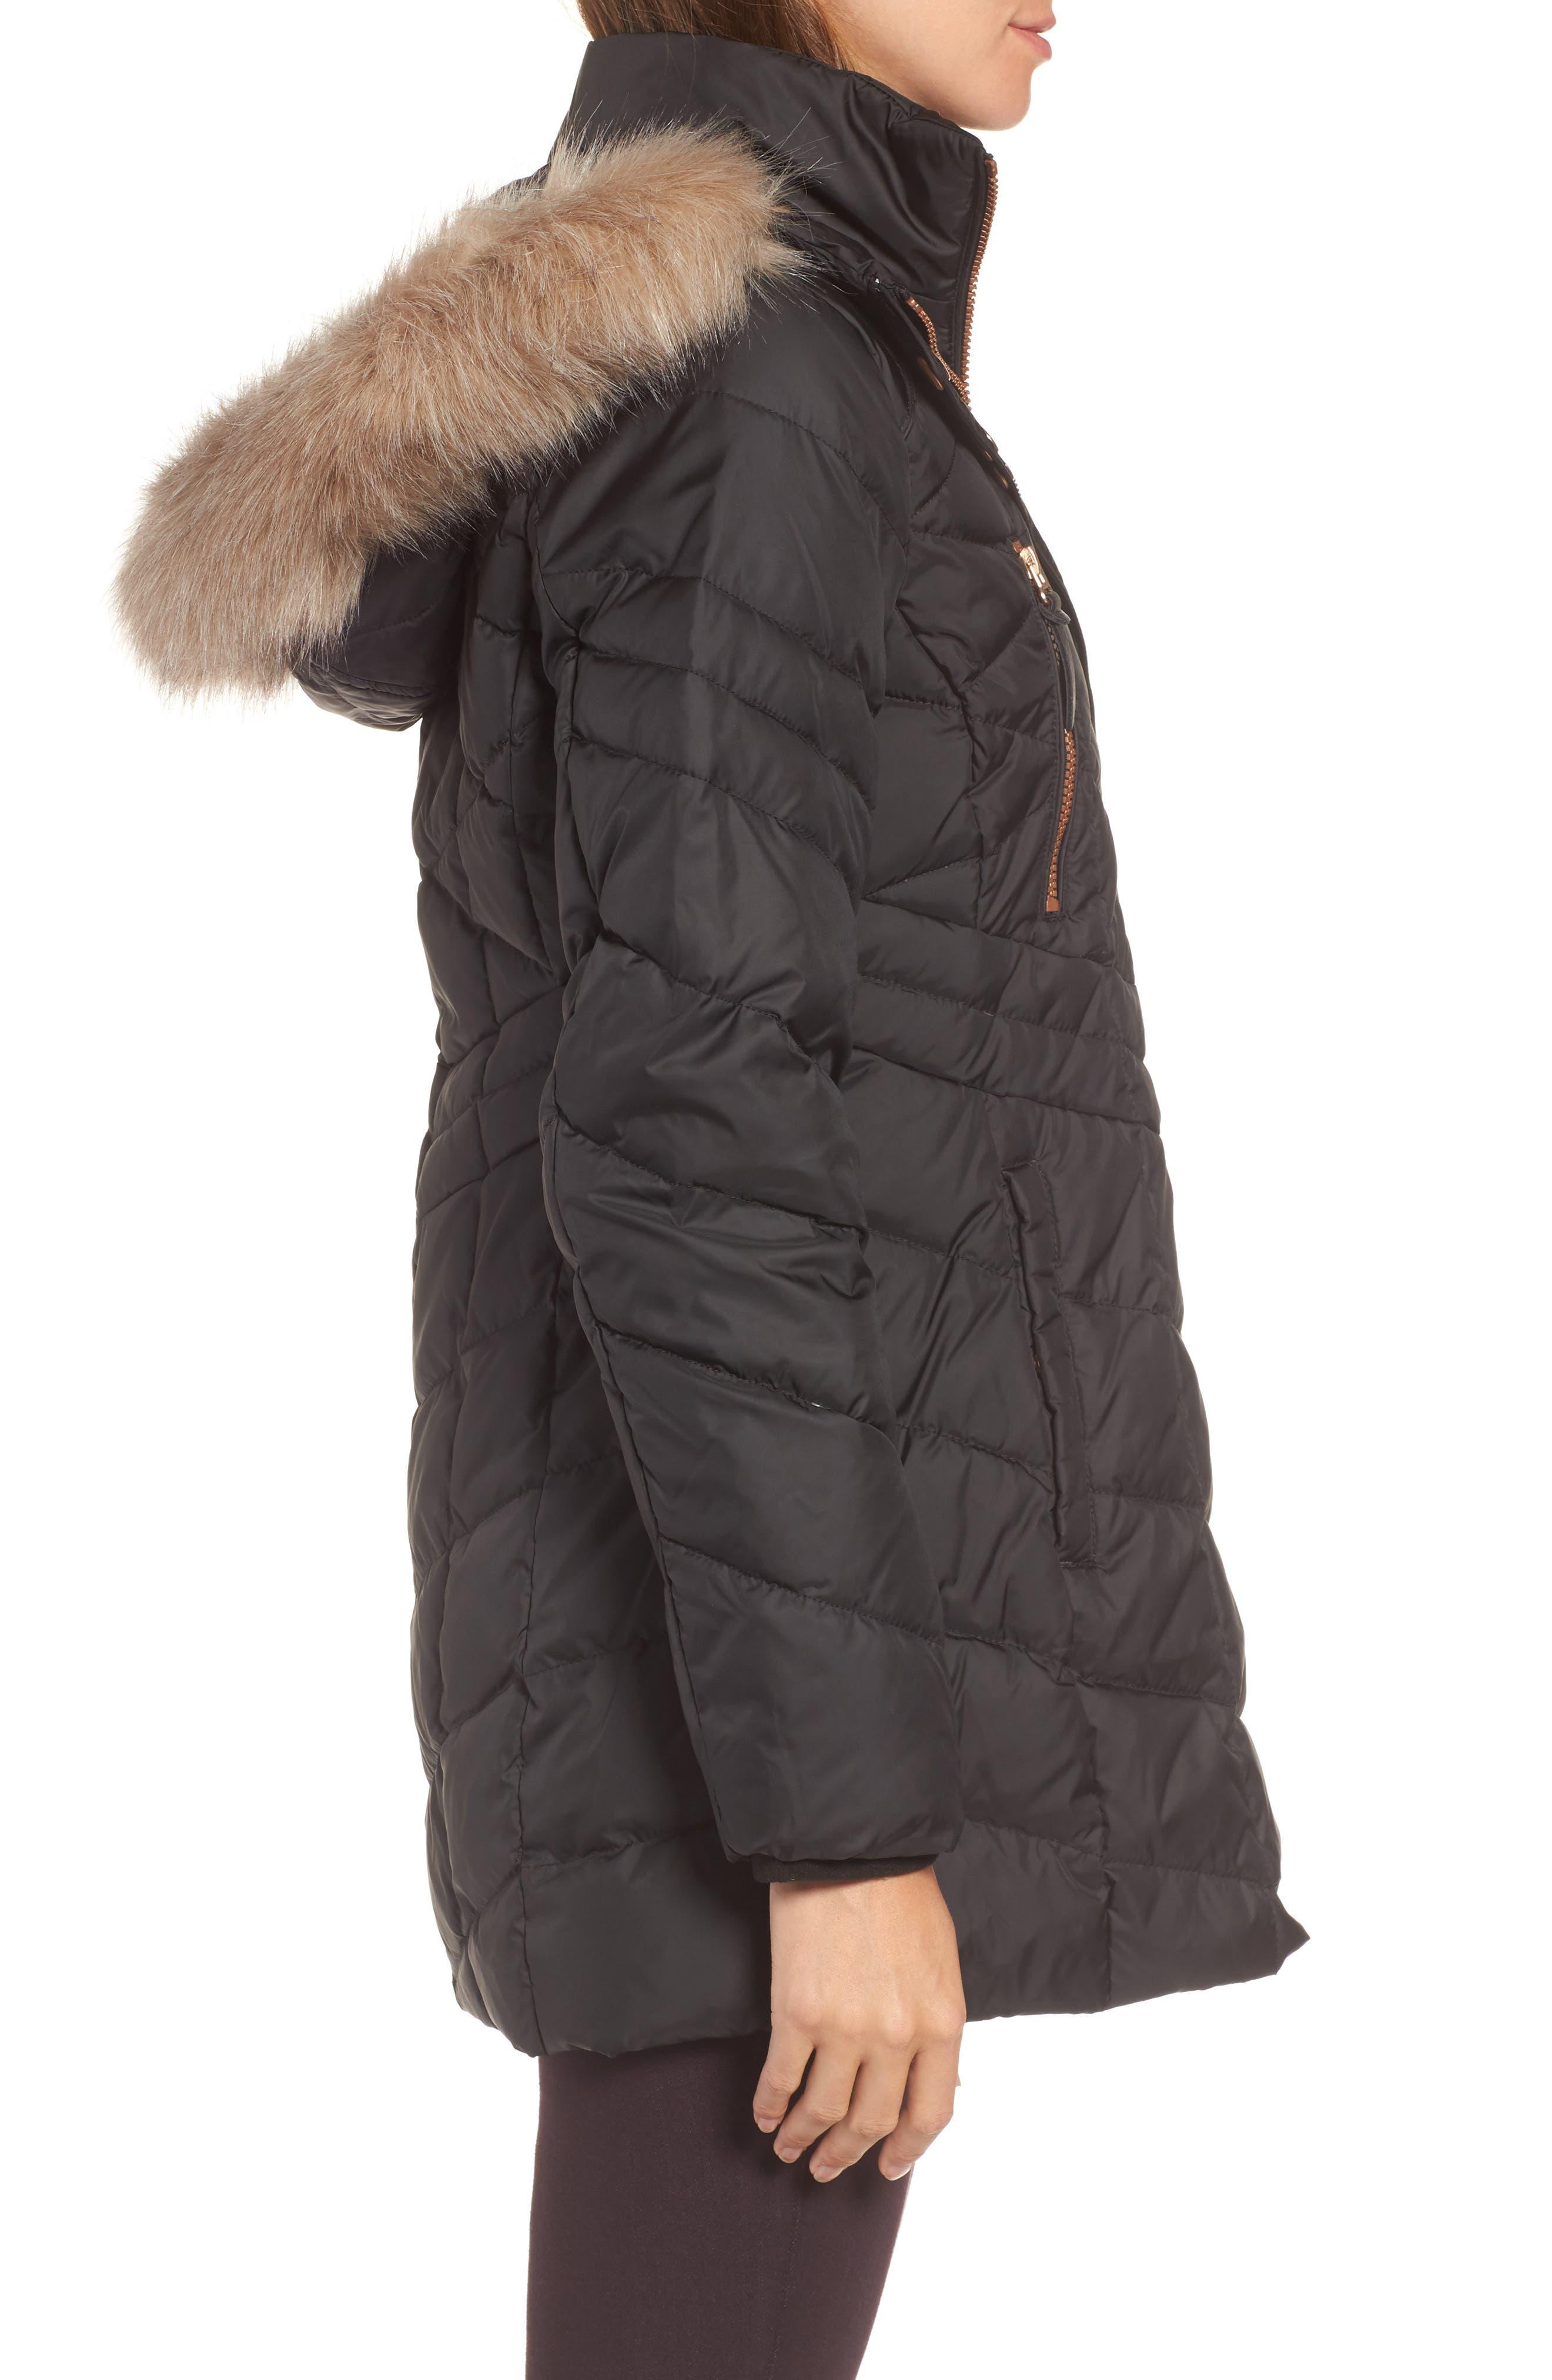 Marley 30 Coat with Detachable Faux Fur,                             Alternate thumbnail 3, color,                             001